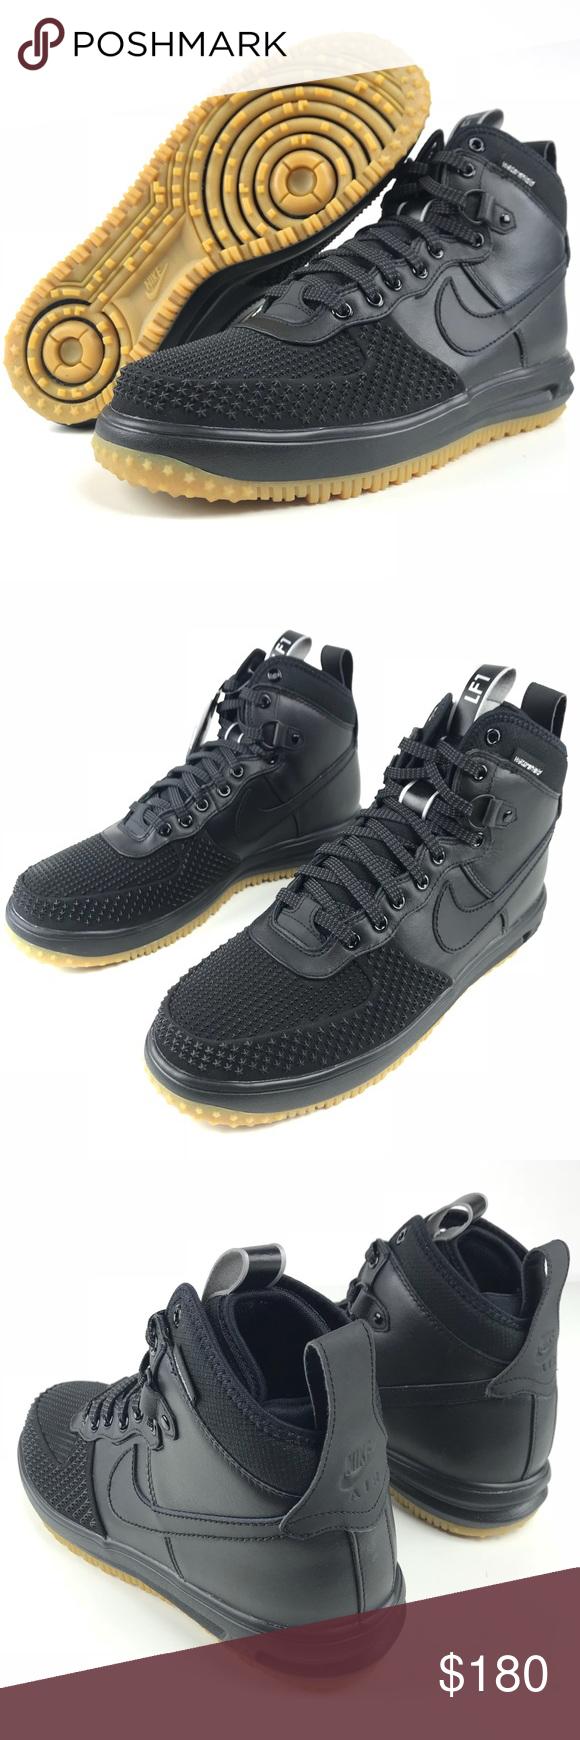 Nike Lunar Force 1 Duckboot Black Where To Buy 805899